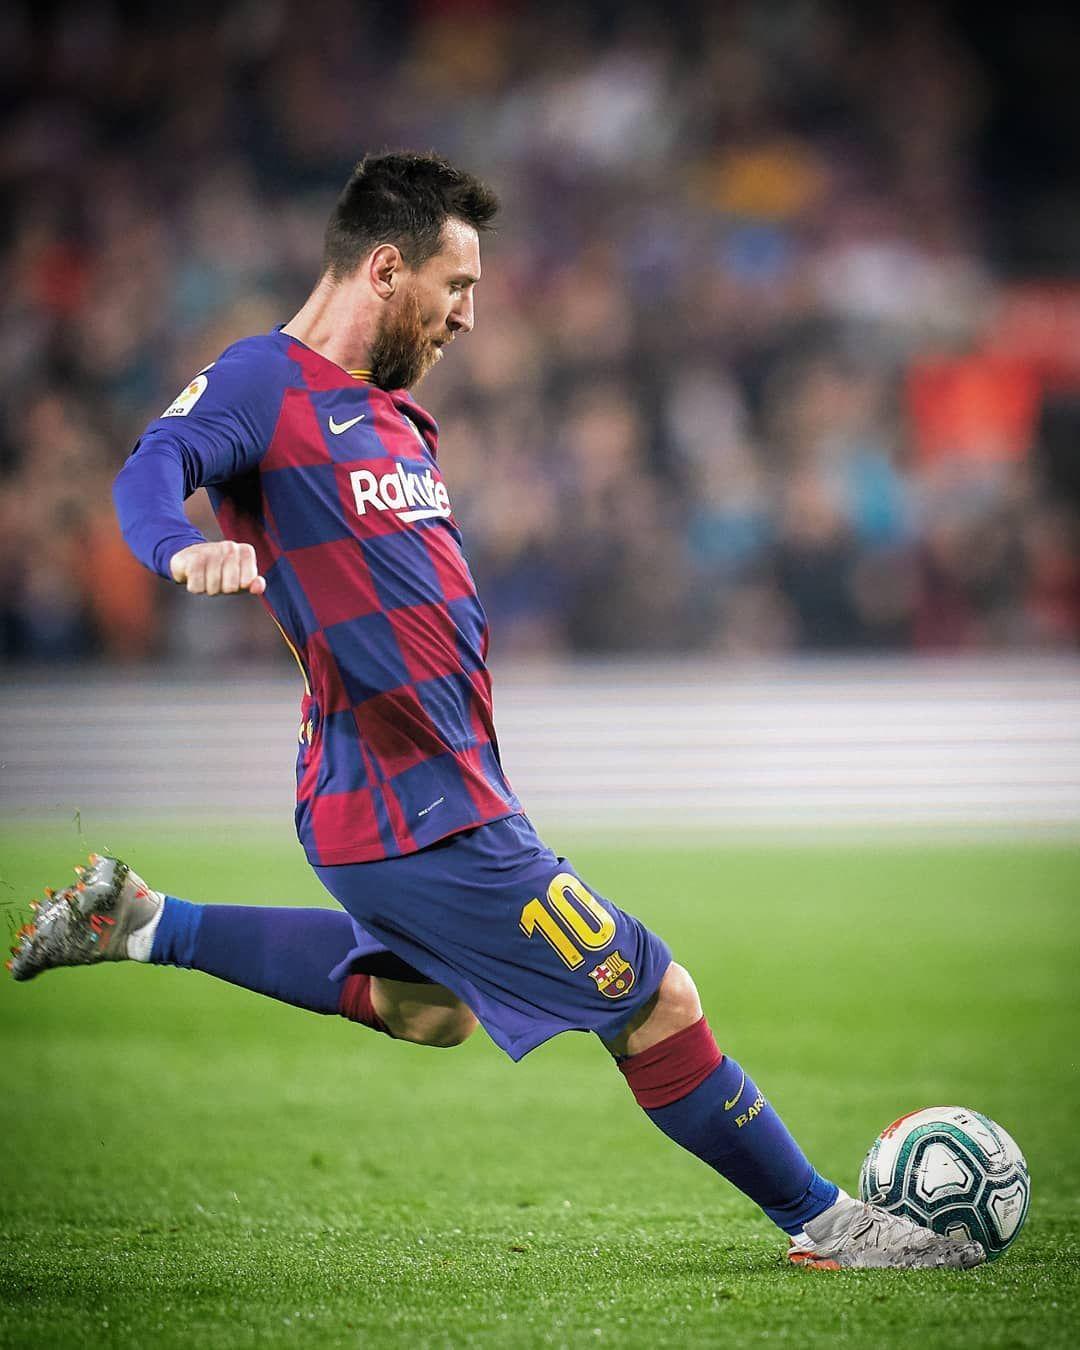 Uefa Champions League On Instagram Free Kick M3ssi Leo Messi Has Now Scored 52 Hat Tricks I Leo Messi Lionel Messi Barcelona Messi Player